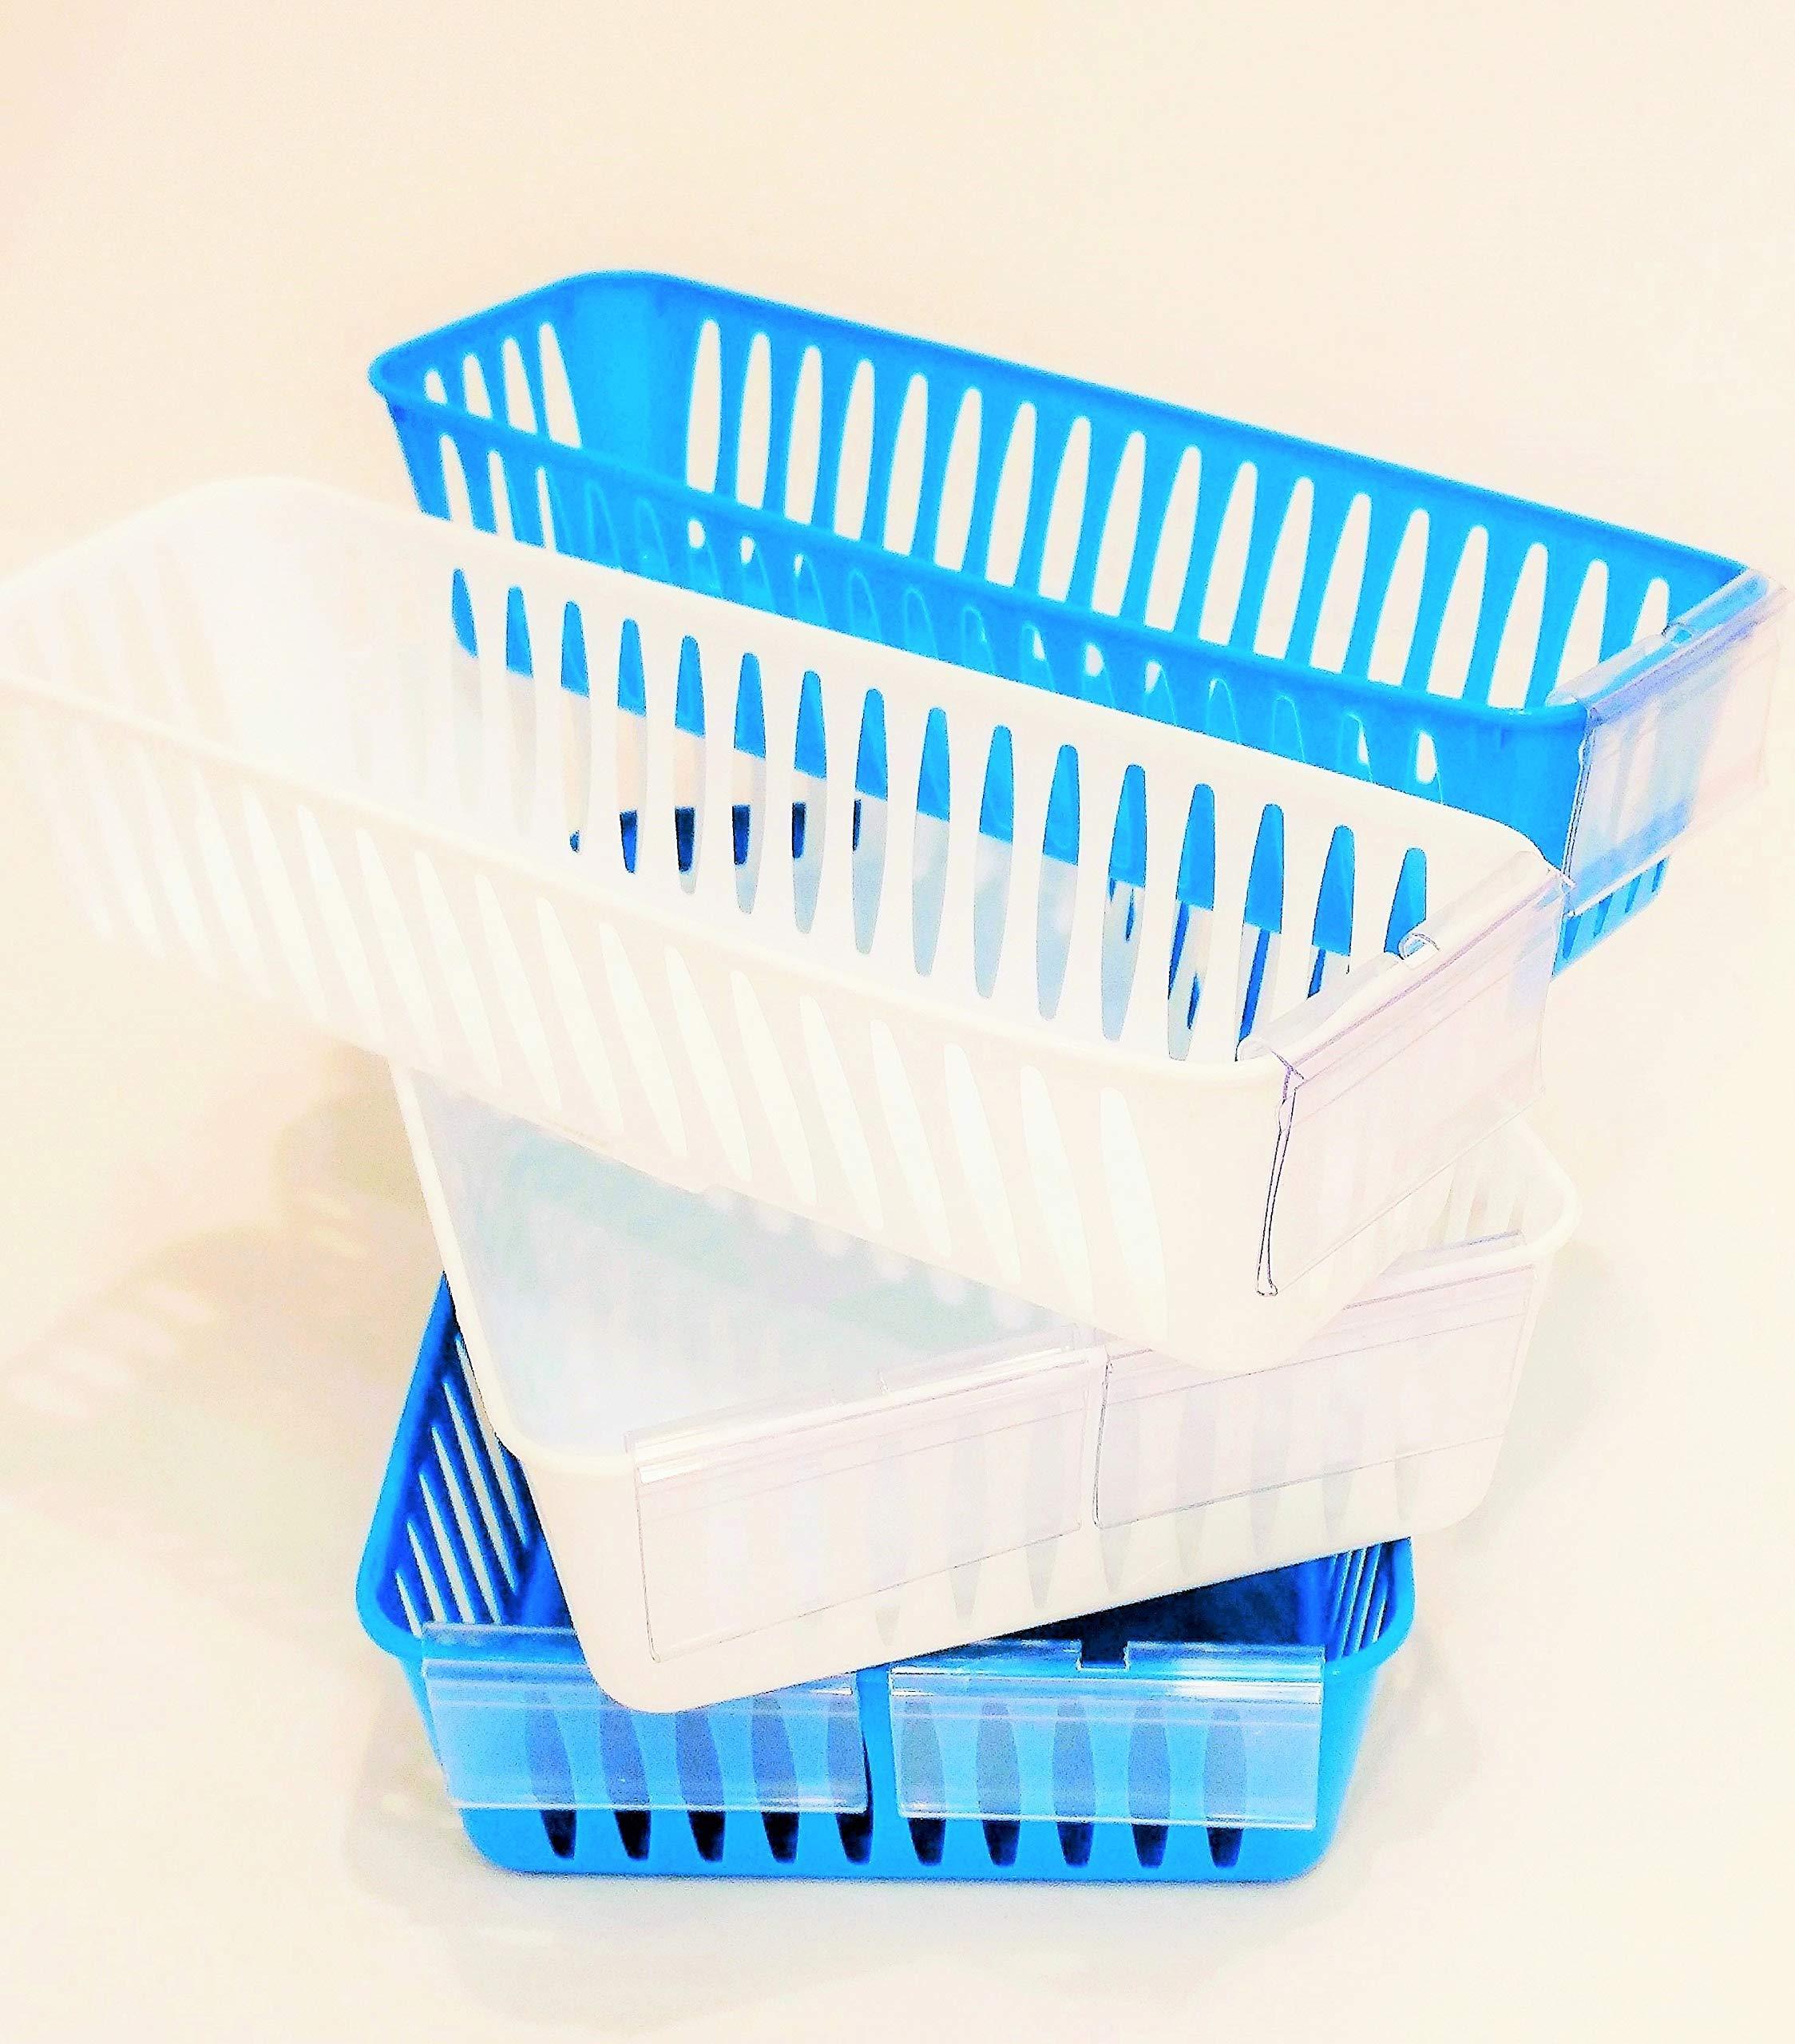 16 Storage Baskets with 24 Label Holders, Assorted Bundle by Quality IZ